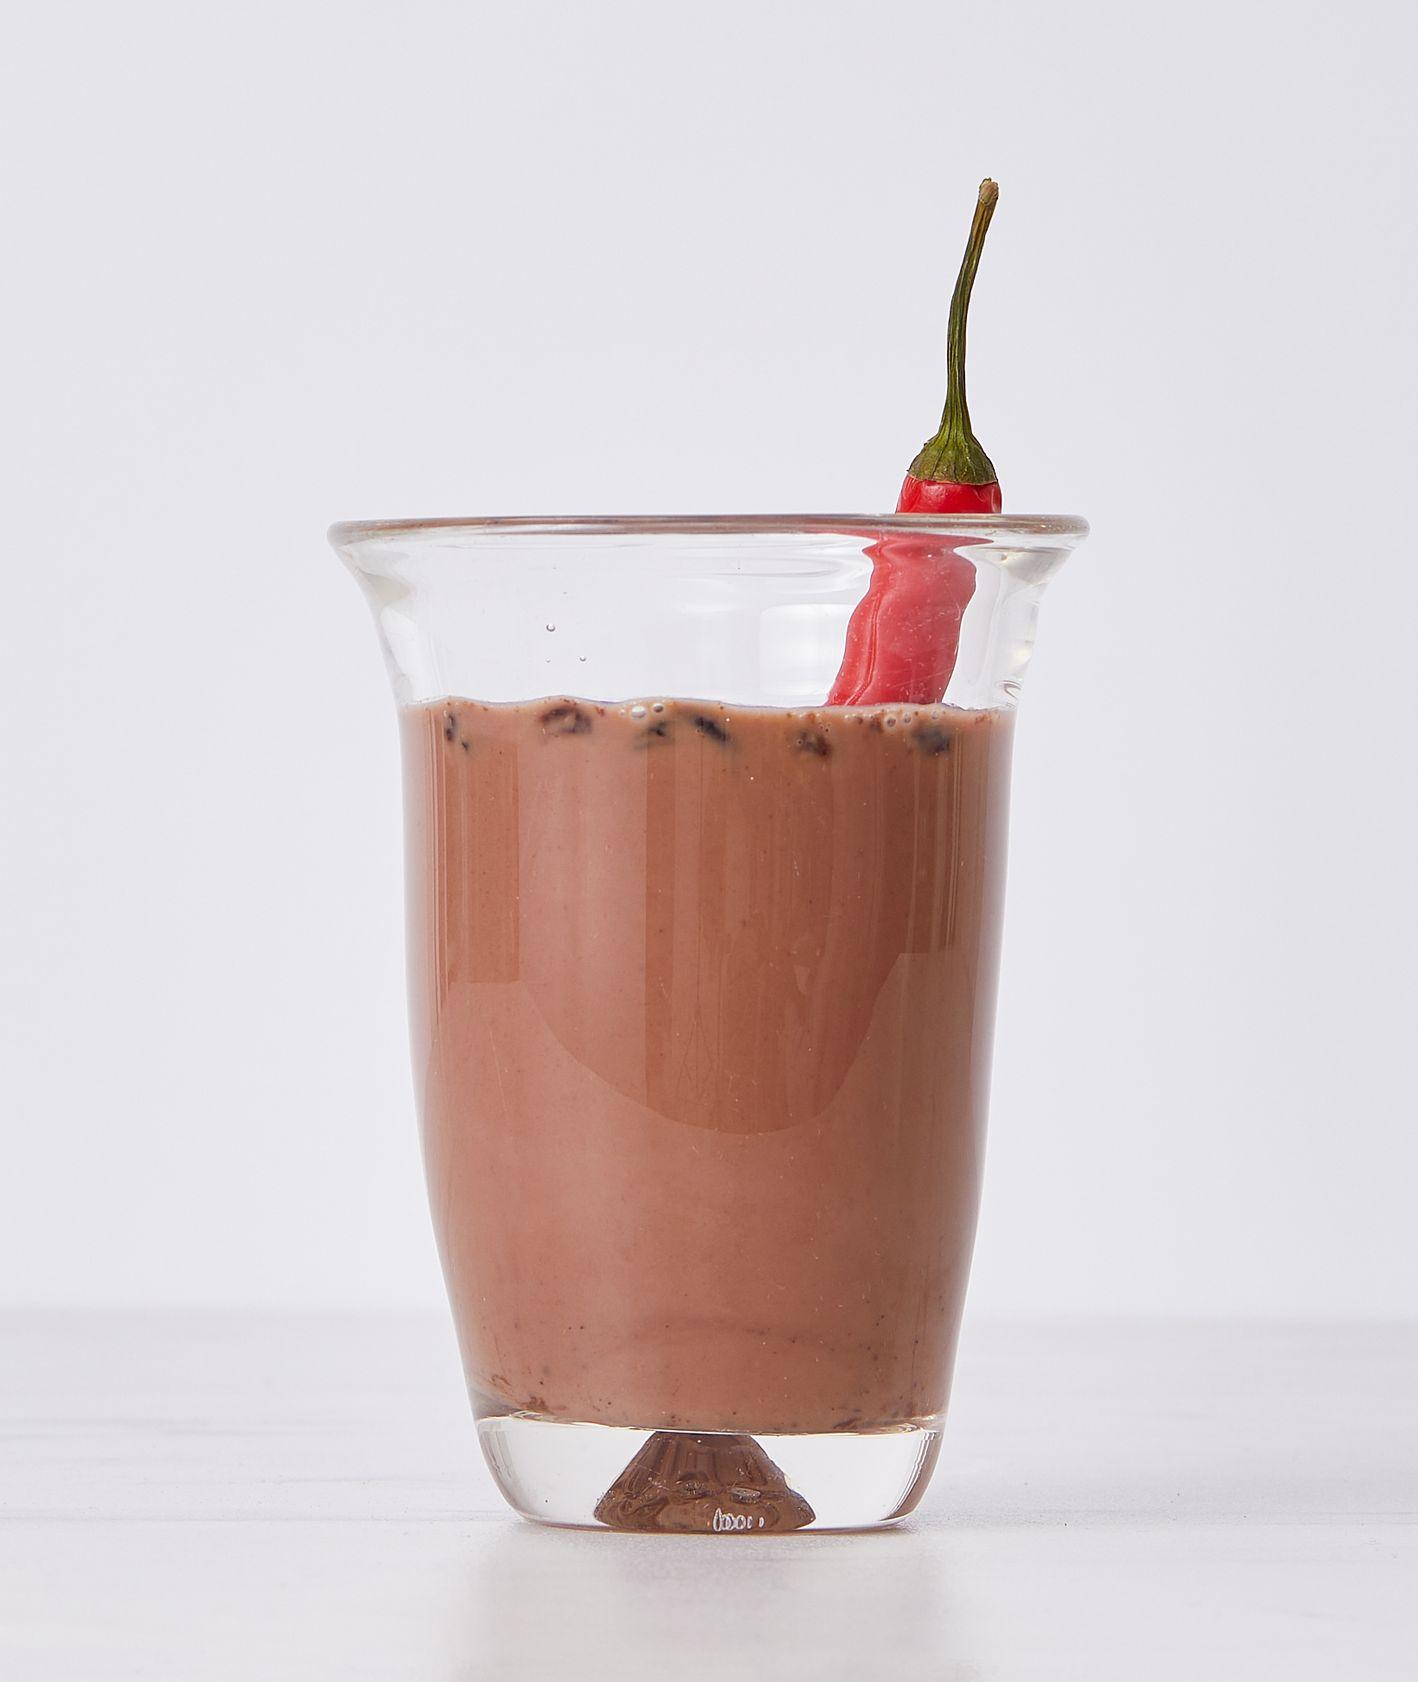 Pikantne kakao (fot. Maciek Niemojewski)